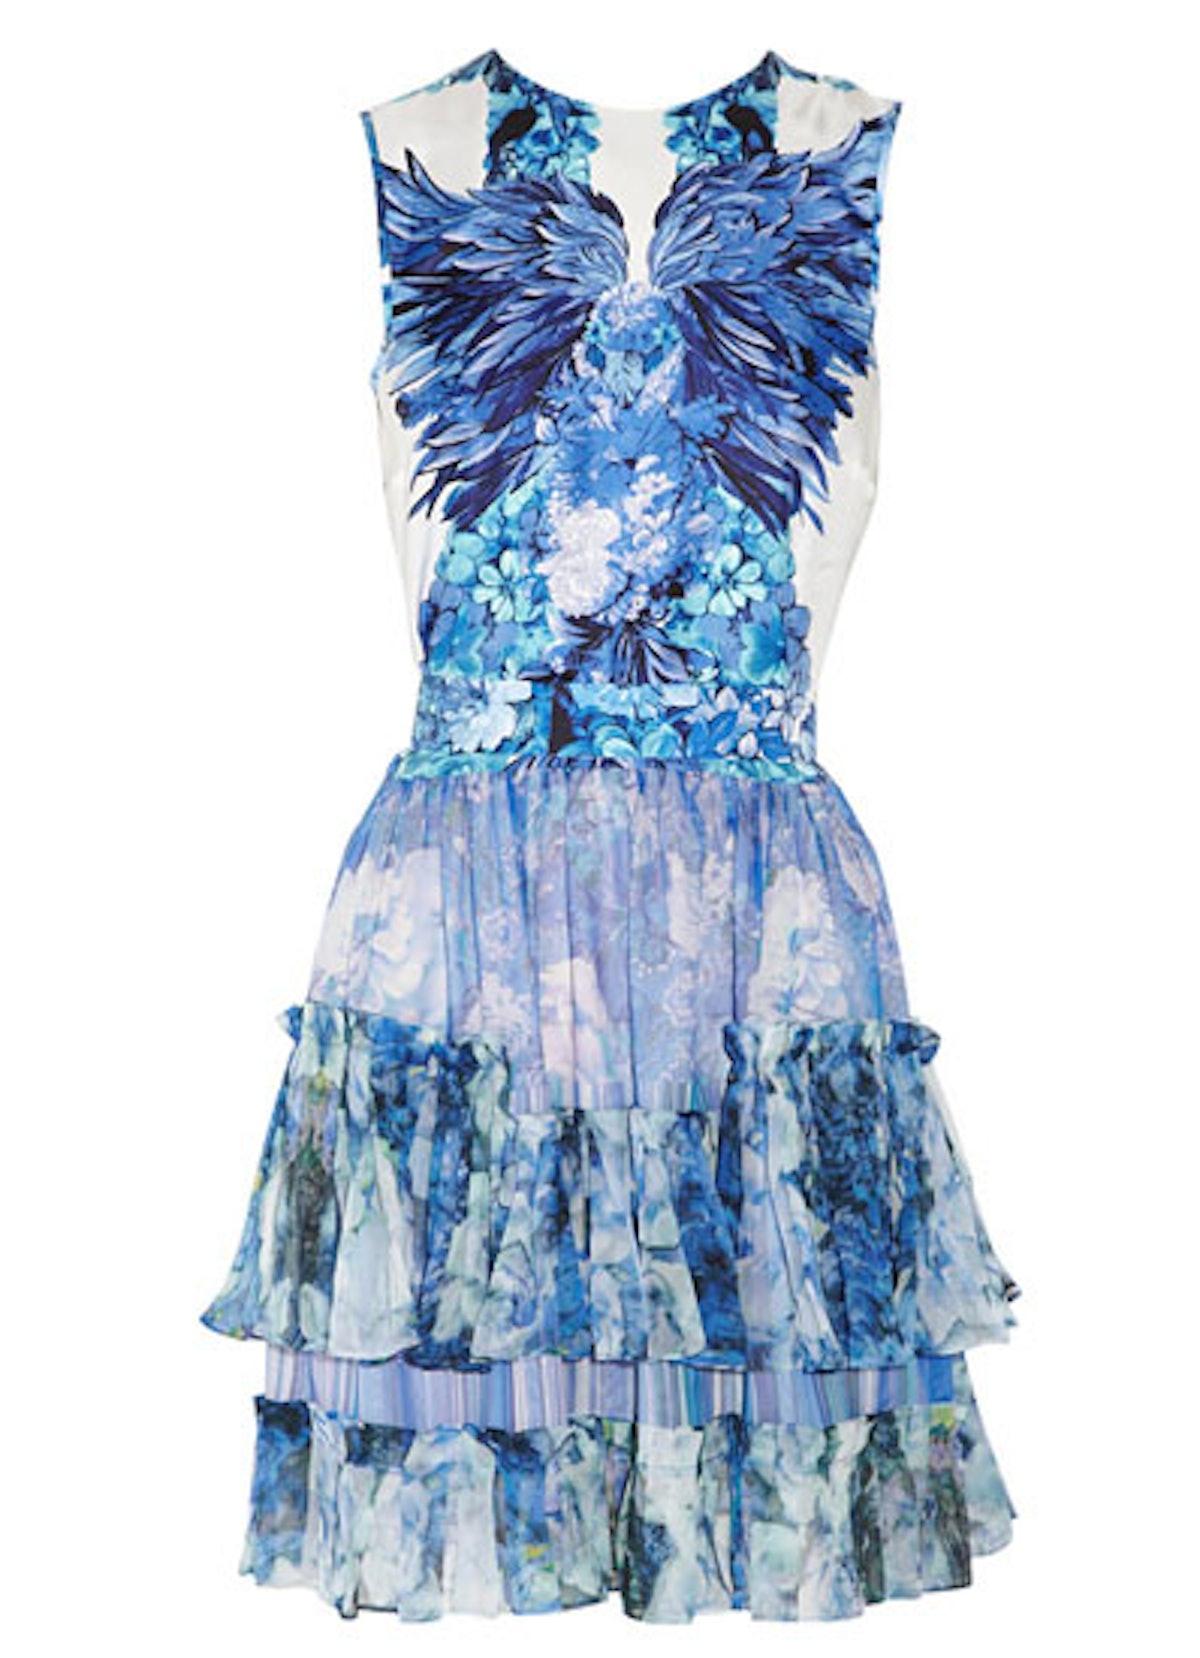 fass-floral-dresses-04-v.jpg